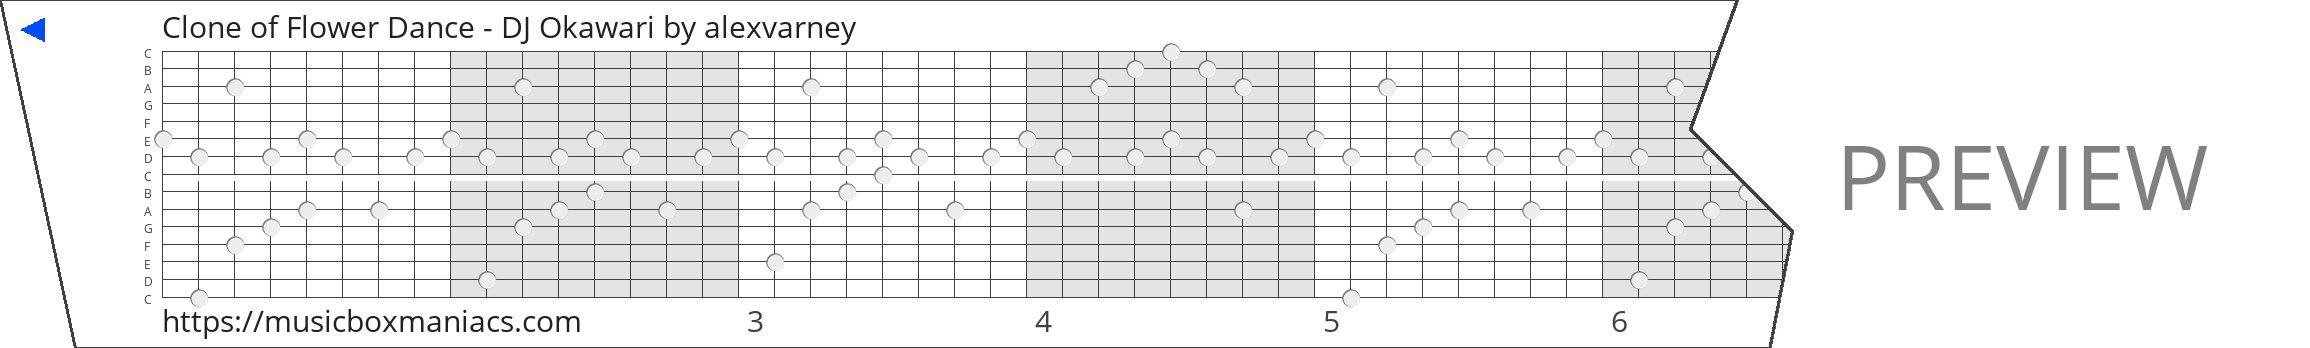 Clone of Flower Dance - DJ Okawari 15 note music box paper strip